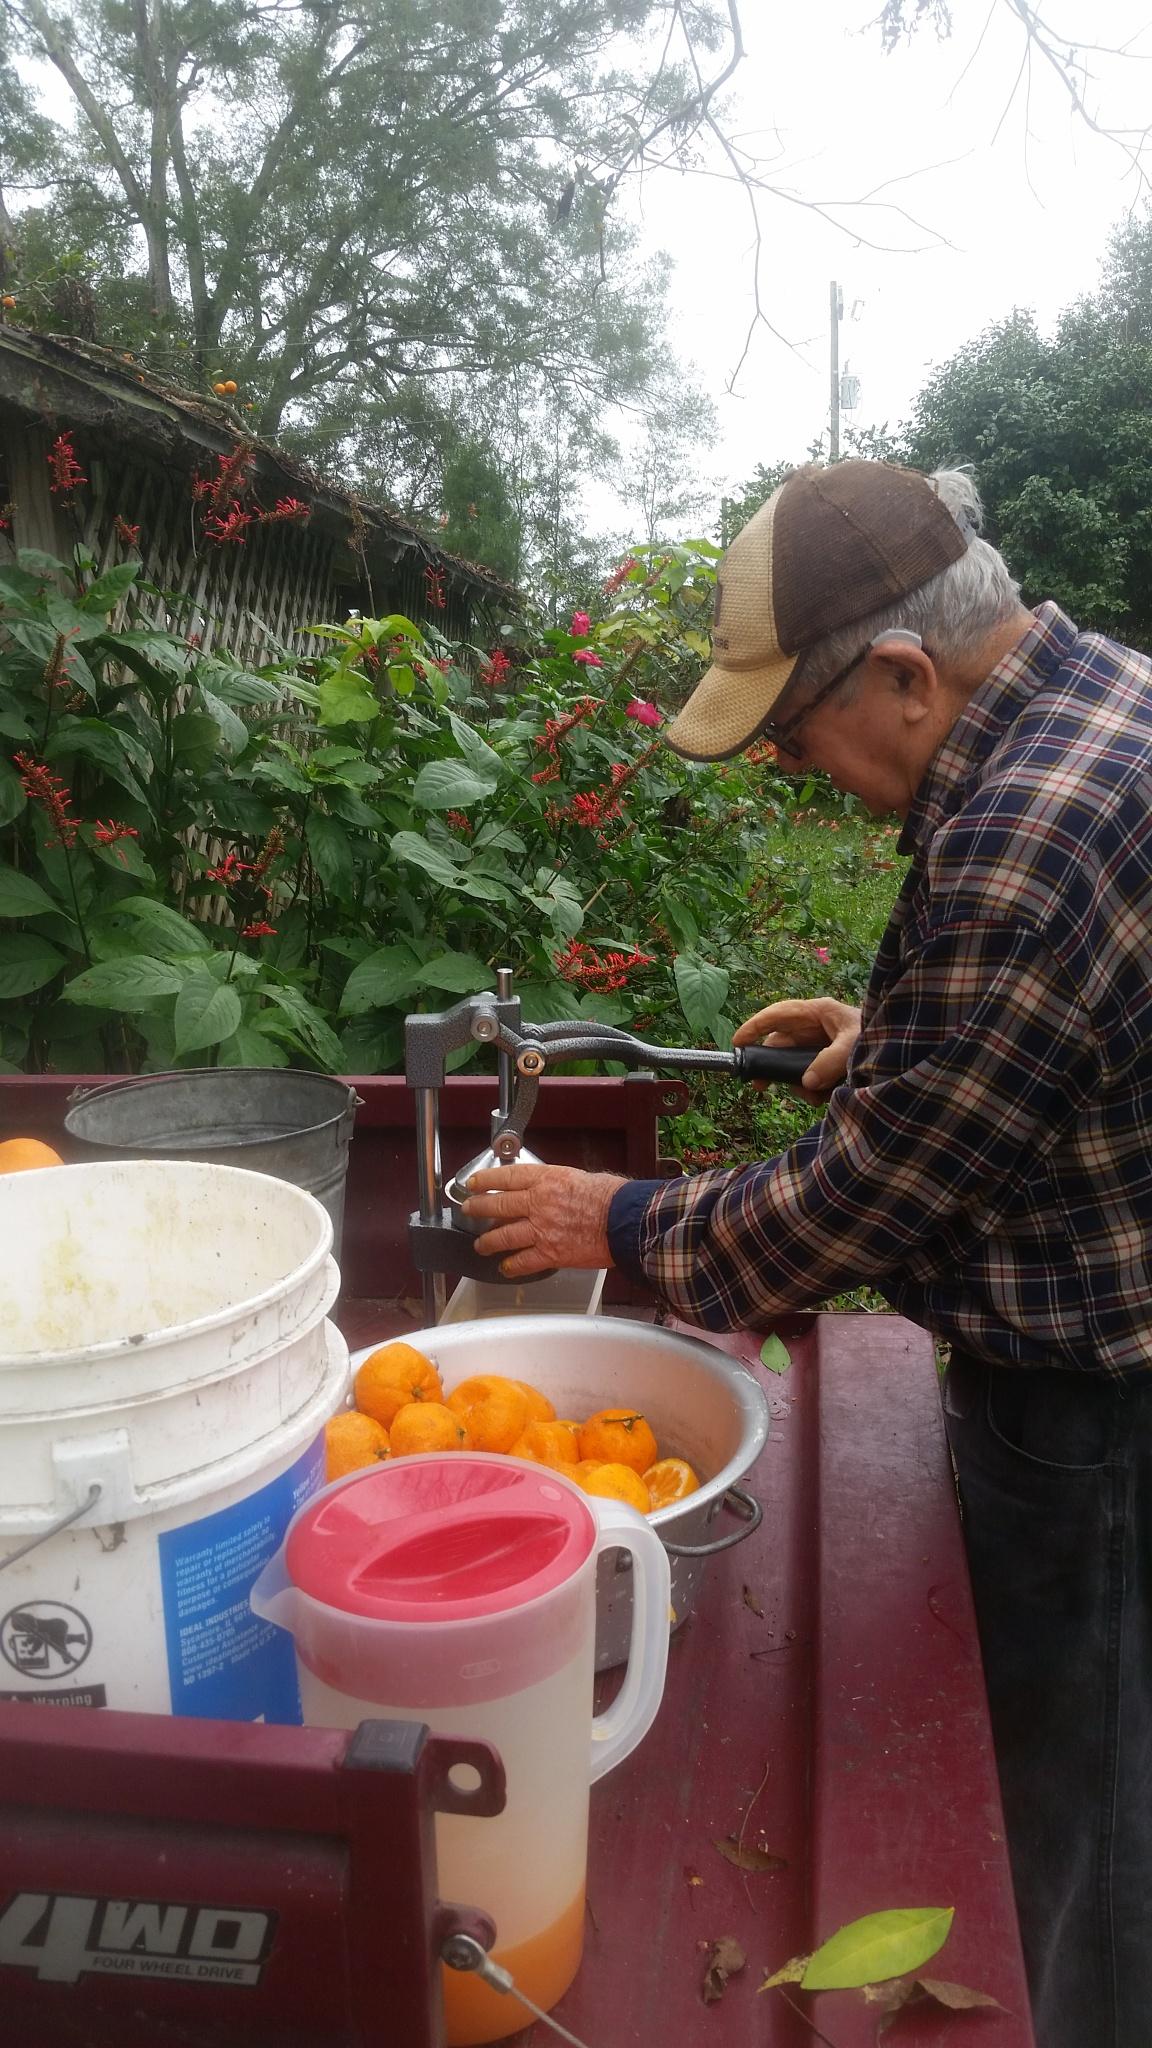 Juicing tangerines  by Ed Barron